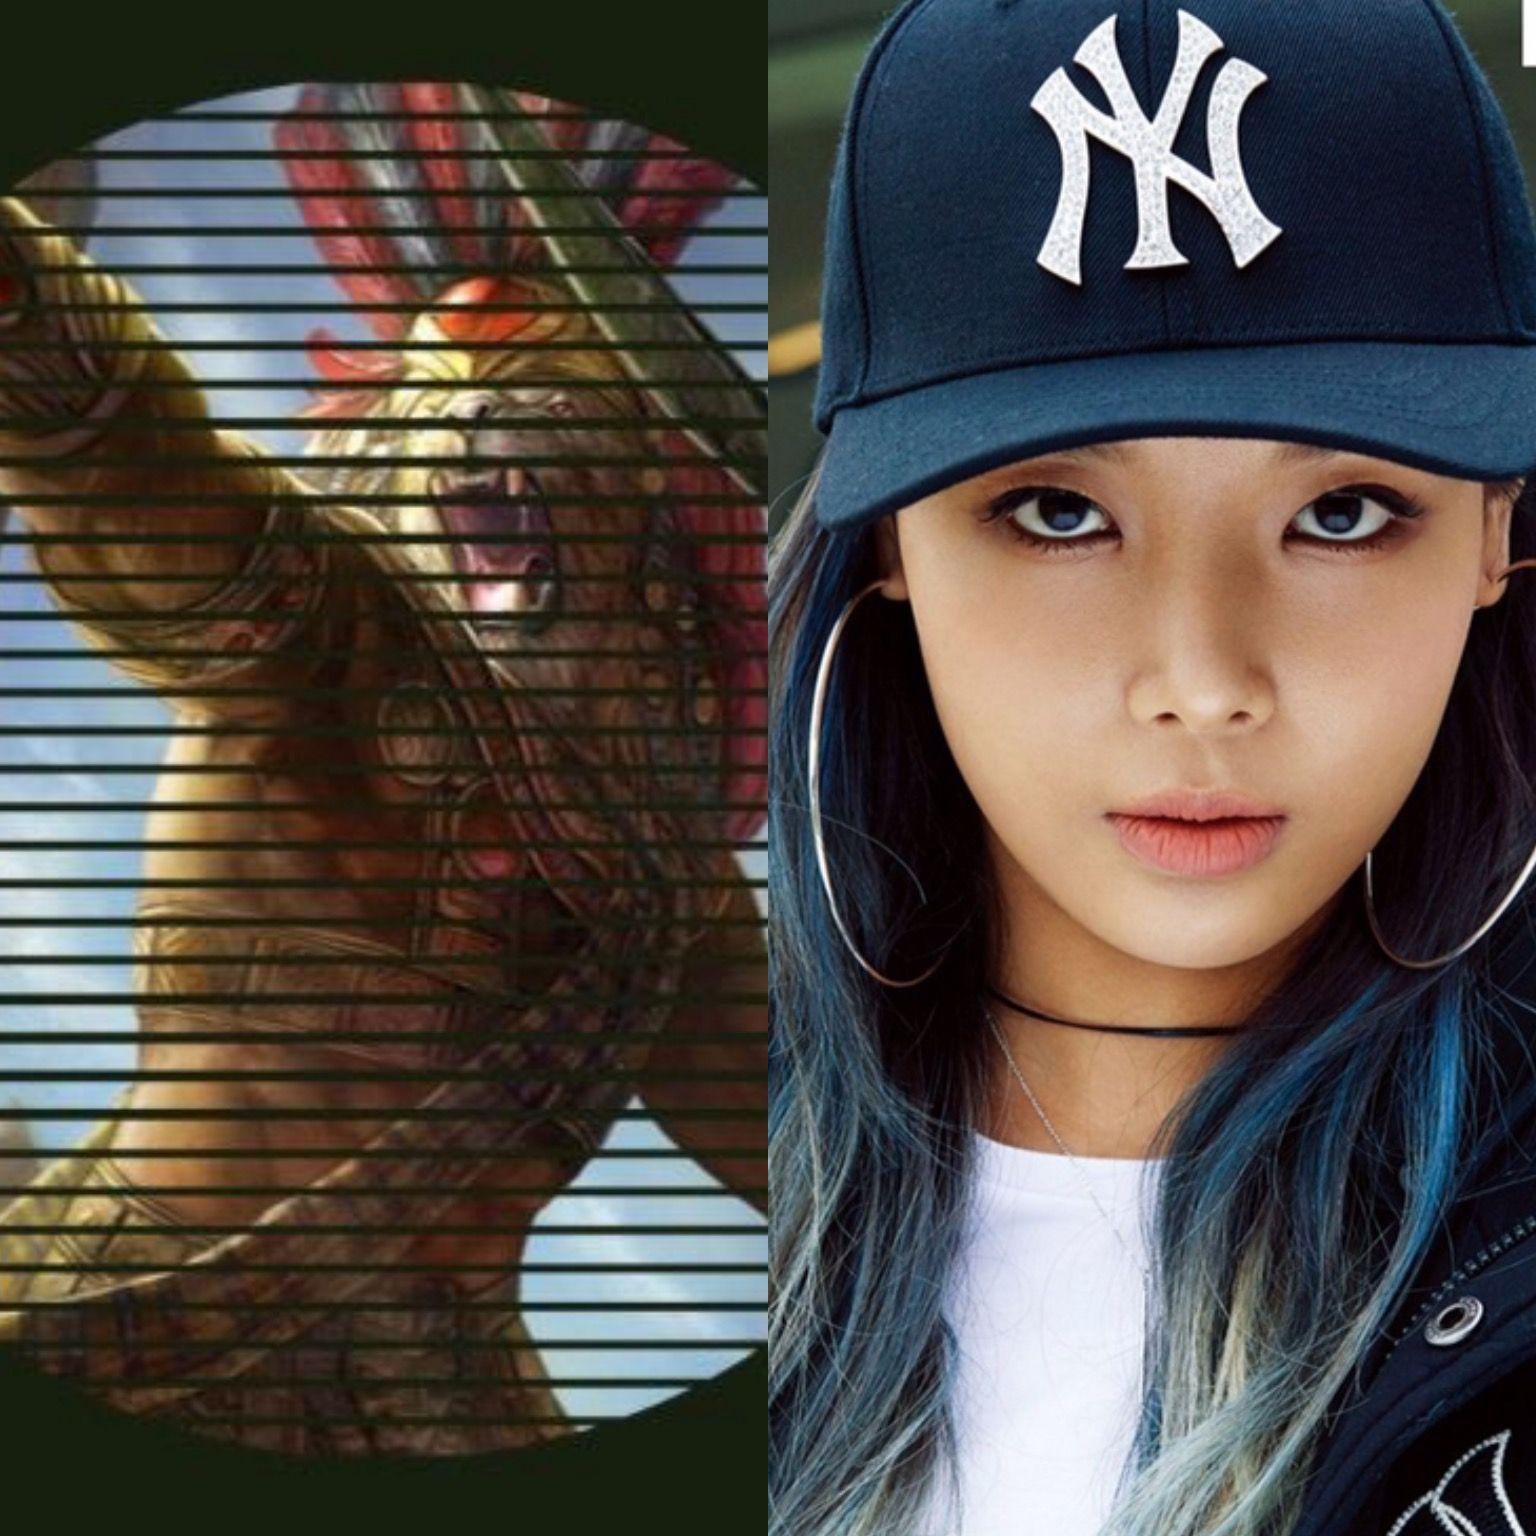 EgyptianCabins&KPOP // Anhur // Yubin of WonderGirls